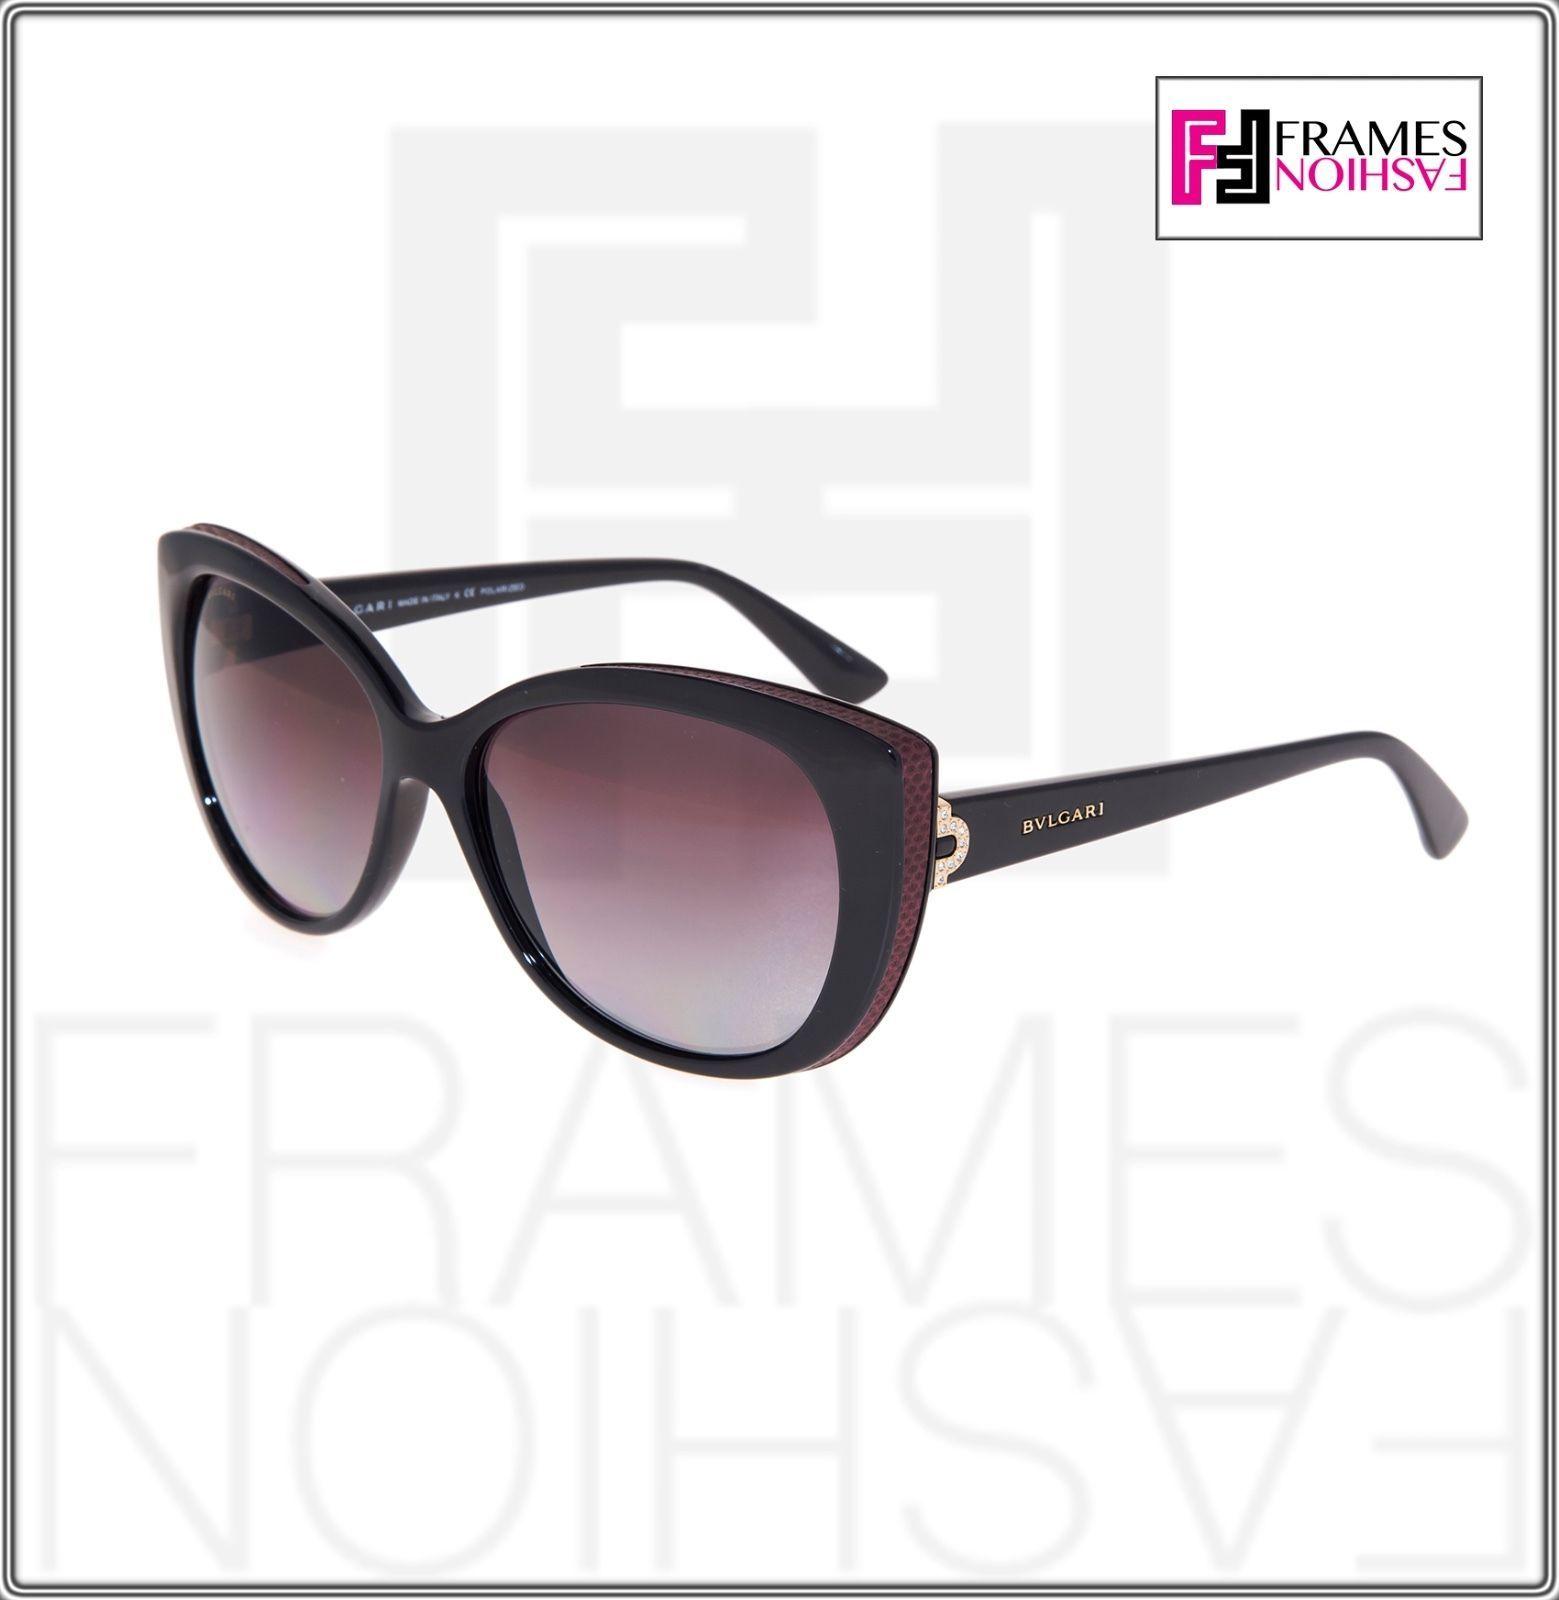 BVLGARI LOGO BV8157BQ Black Burgundy Leather Violet POLARIZED Sunglasses 8157 image 7